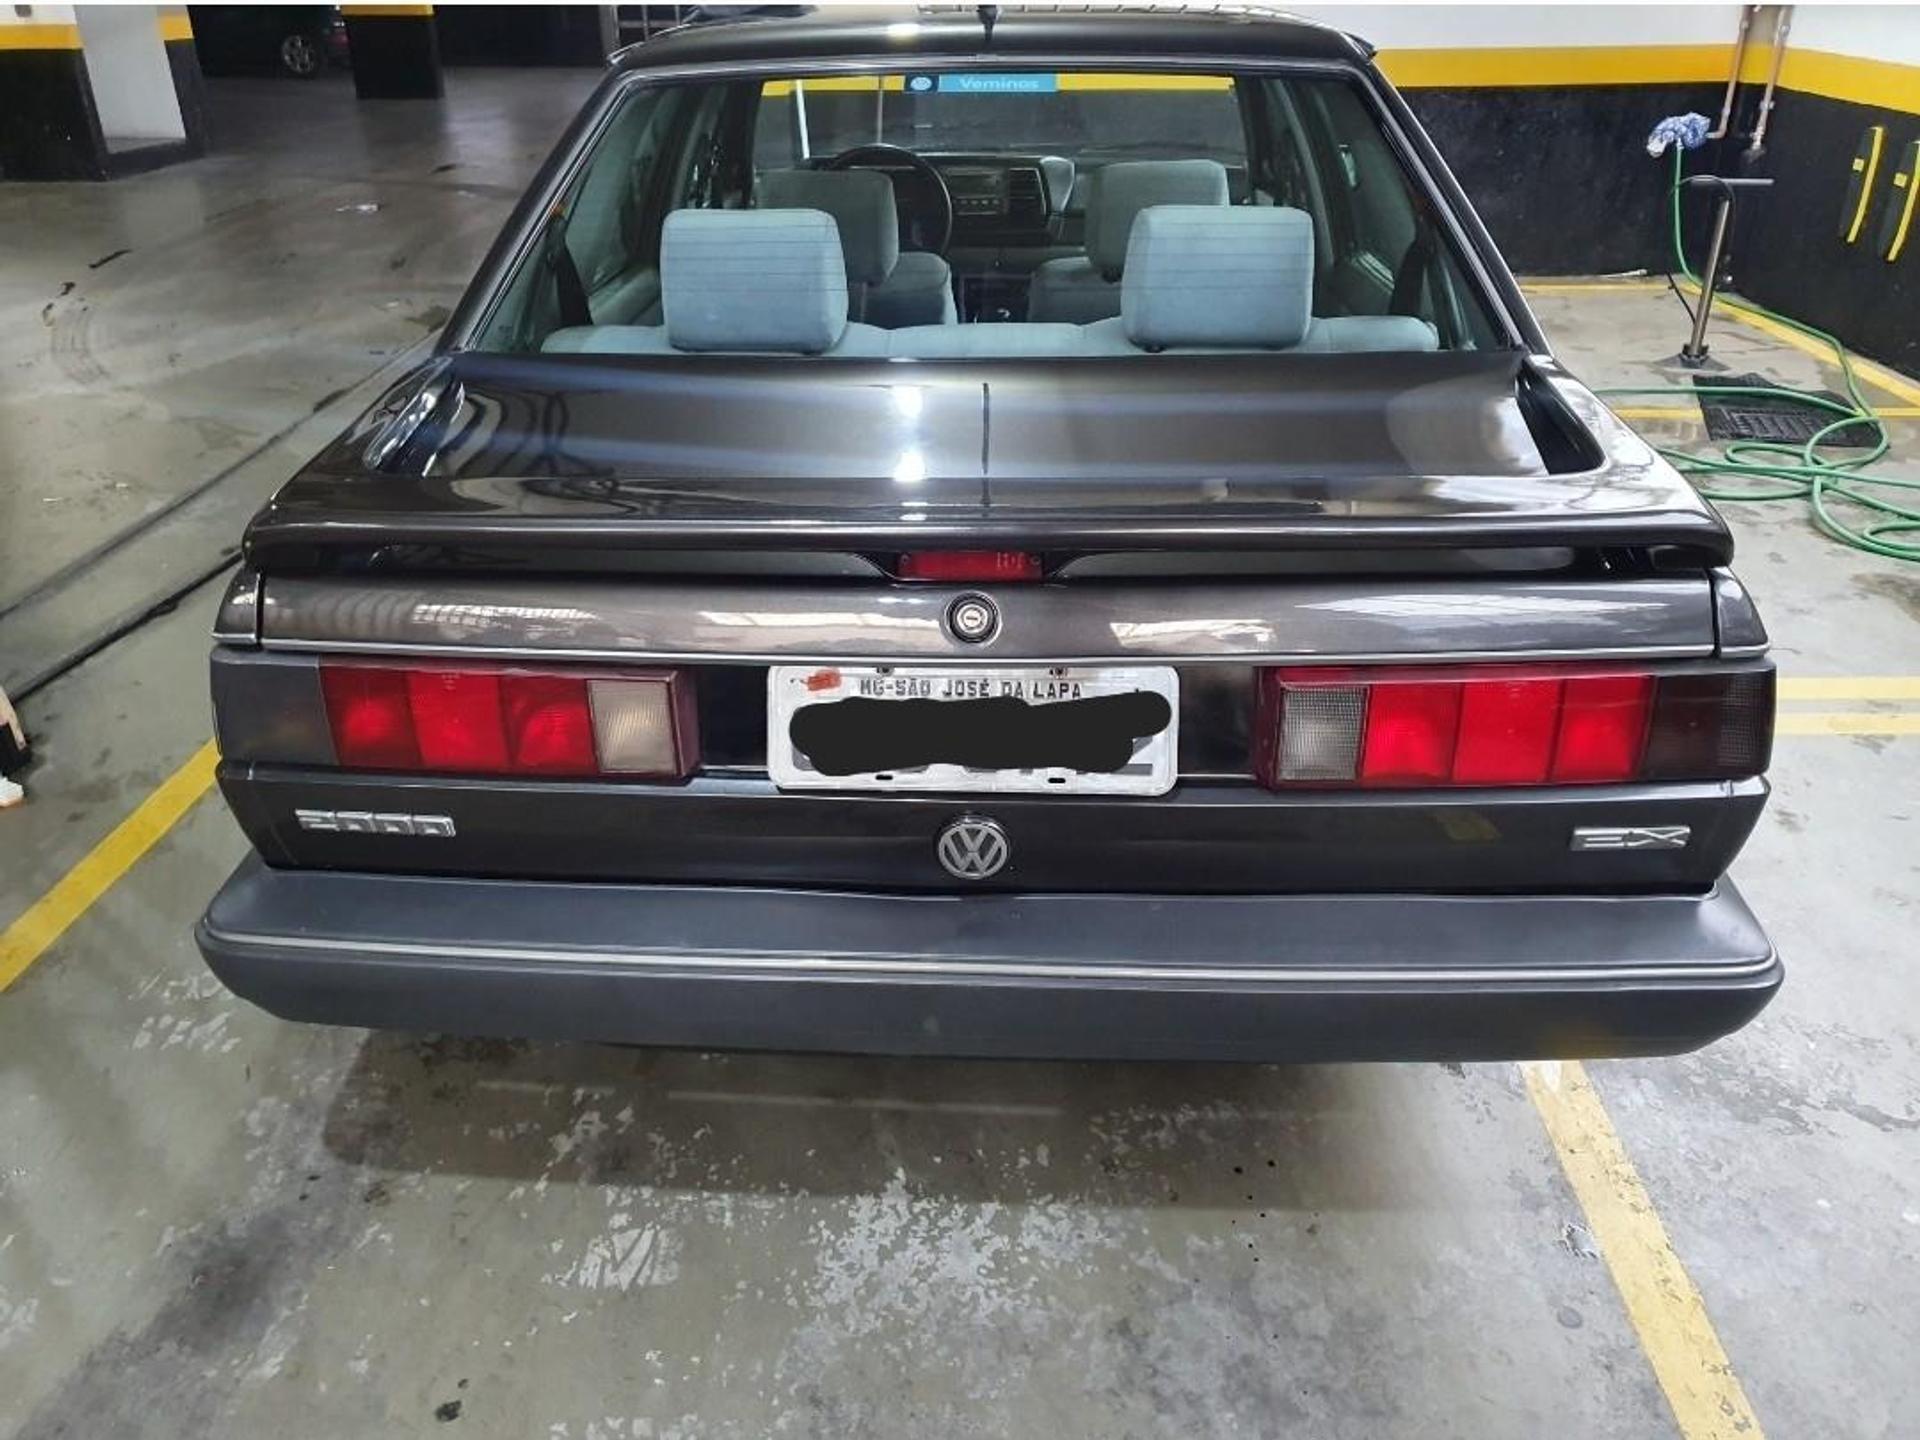 Volkswagen Santana 2.0 I Executivo 8v Gasolina 4p Manual Wmimagem15220698525